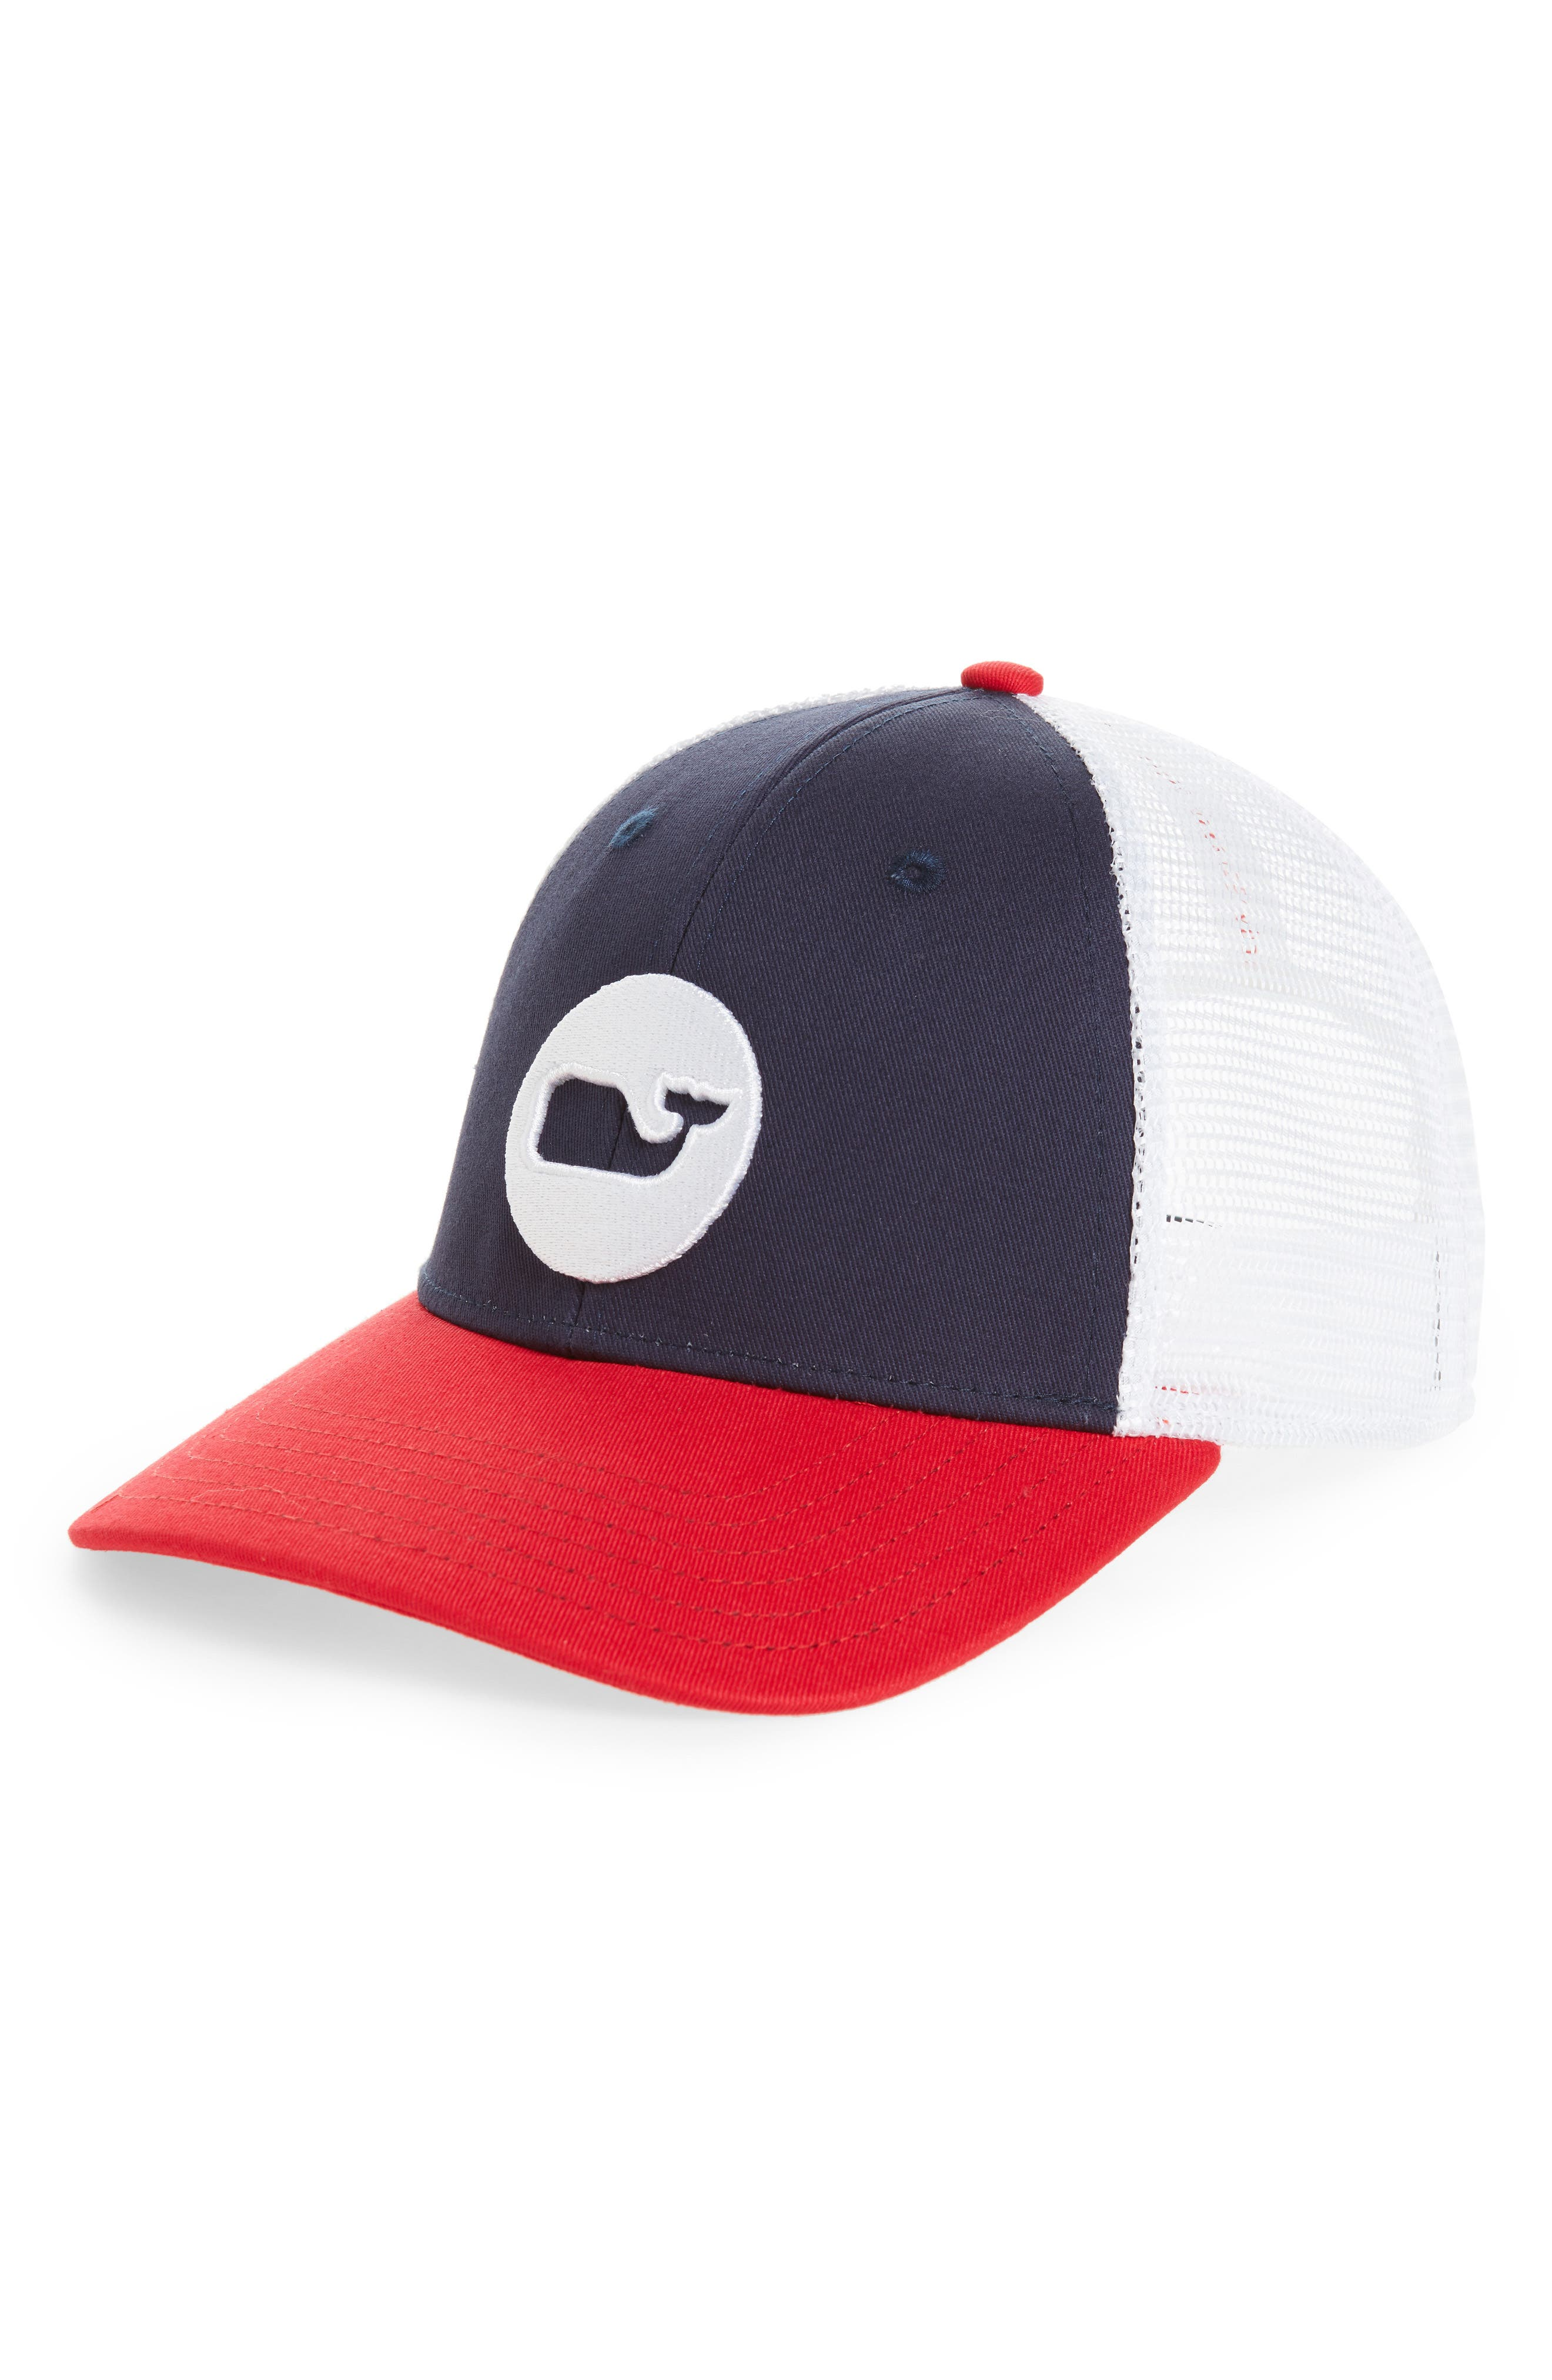 vineyard vines Whale Dot Trucker Cap